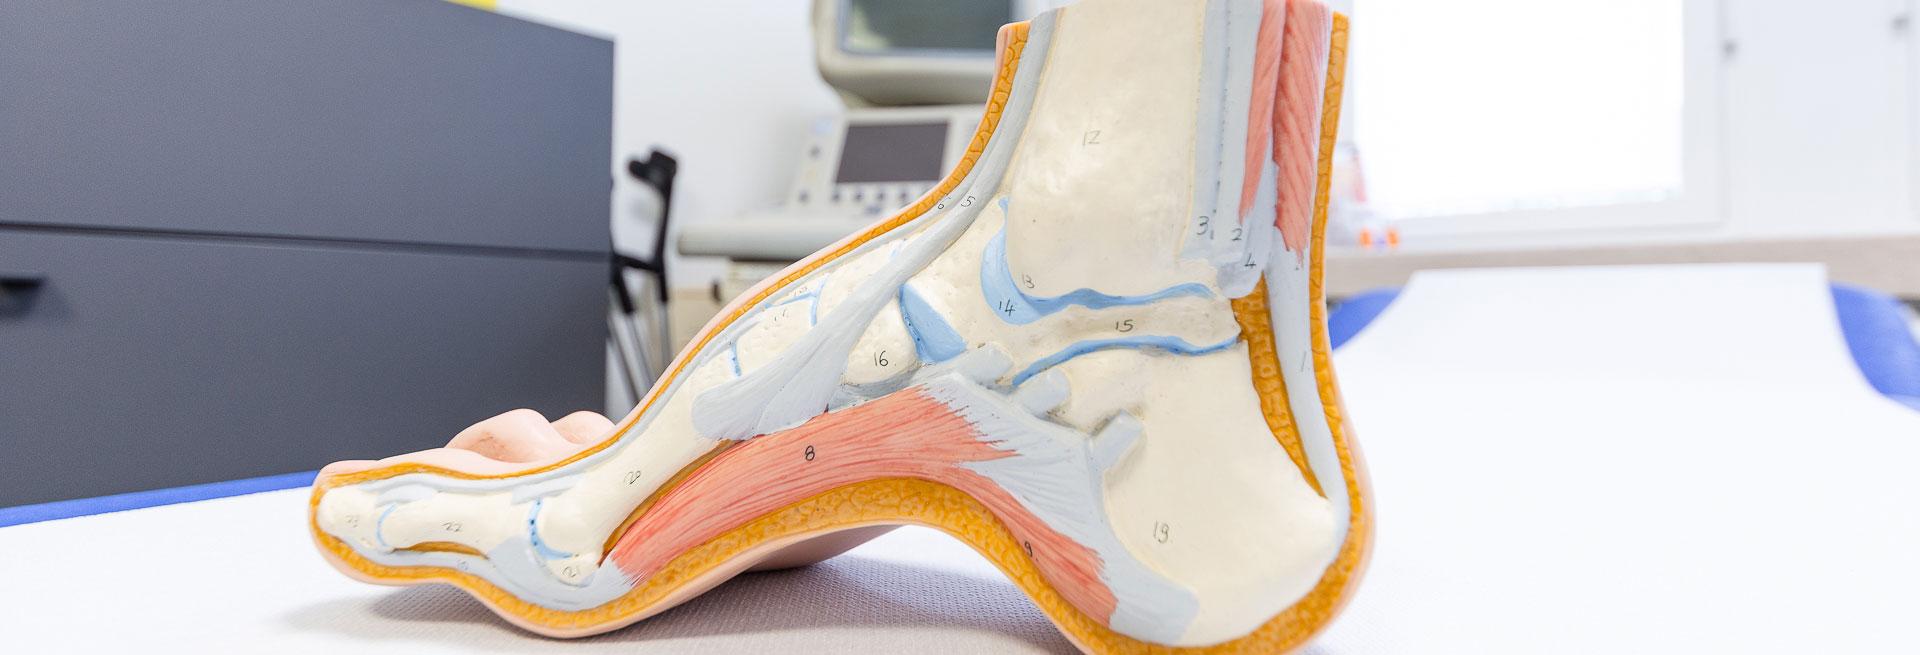 Orthopädische Praxis Saarlouis